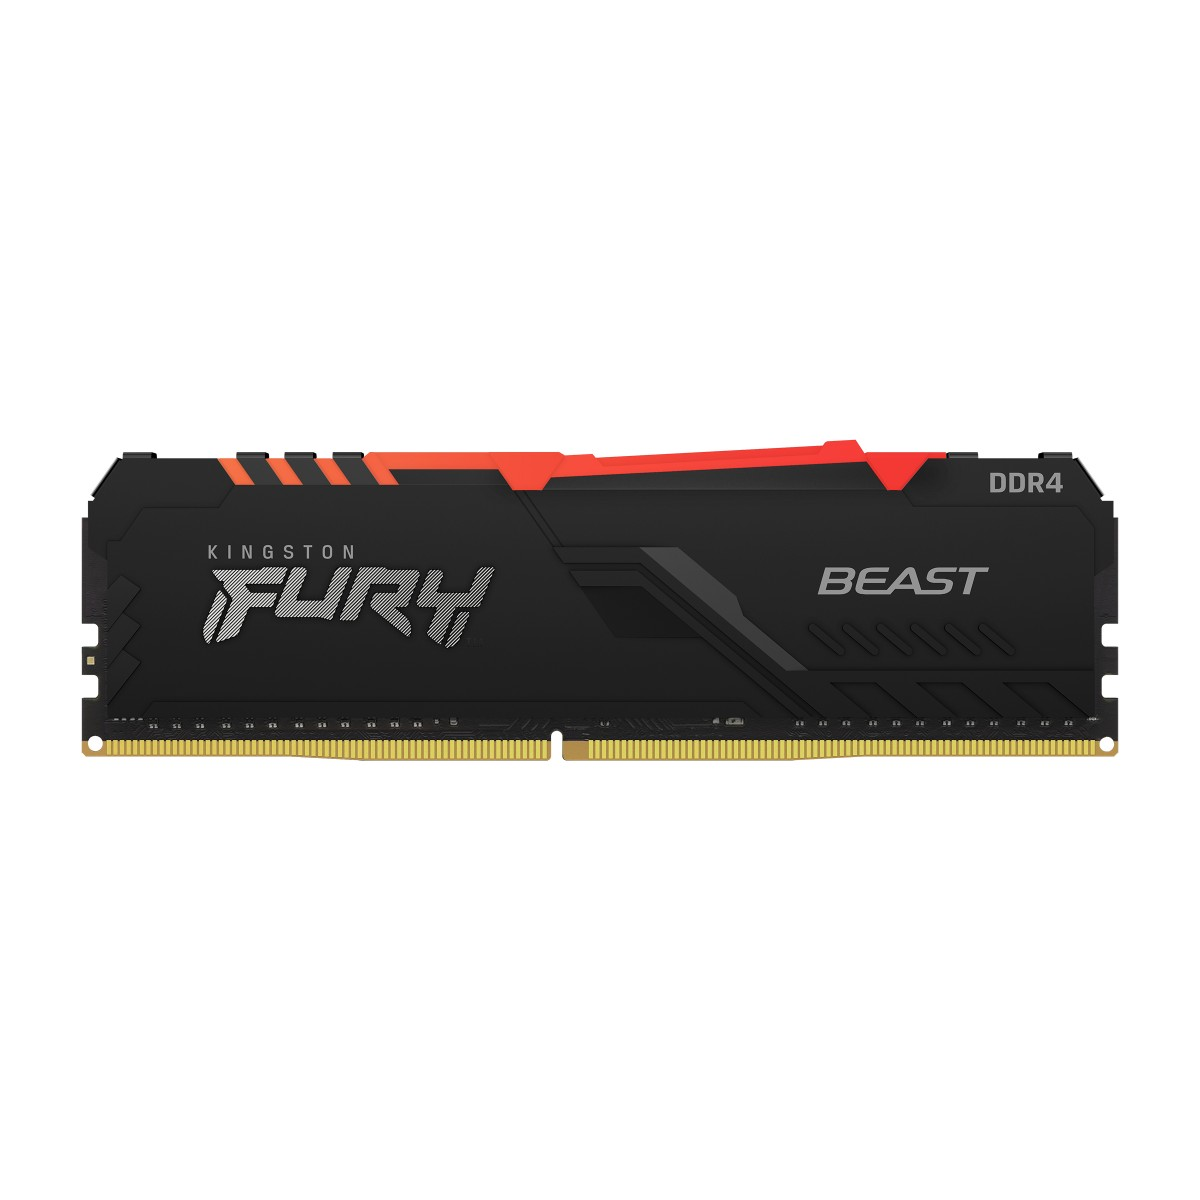 Memória Kingston Fury Beast RGB, 16GB,(2x8GB), 3000Mhz, DDR4, CL15, Preto, KF430C15BBAK2/16